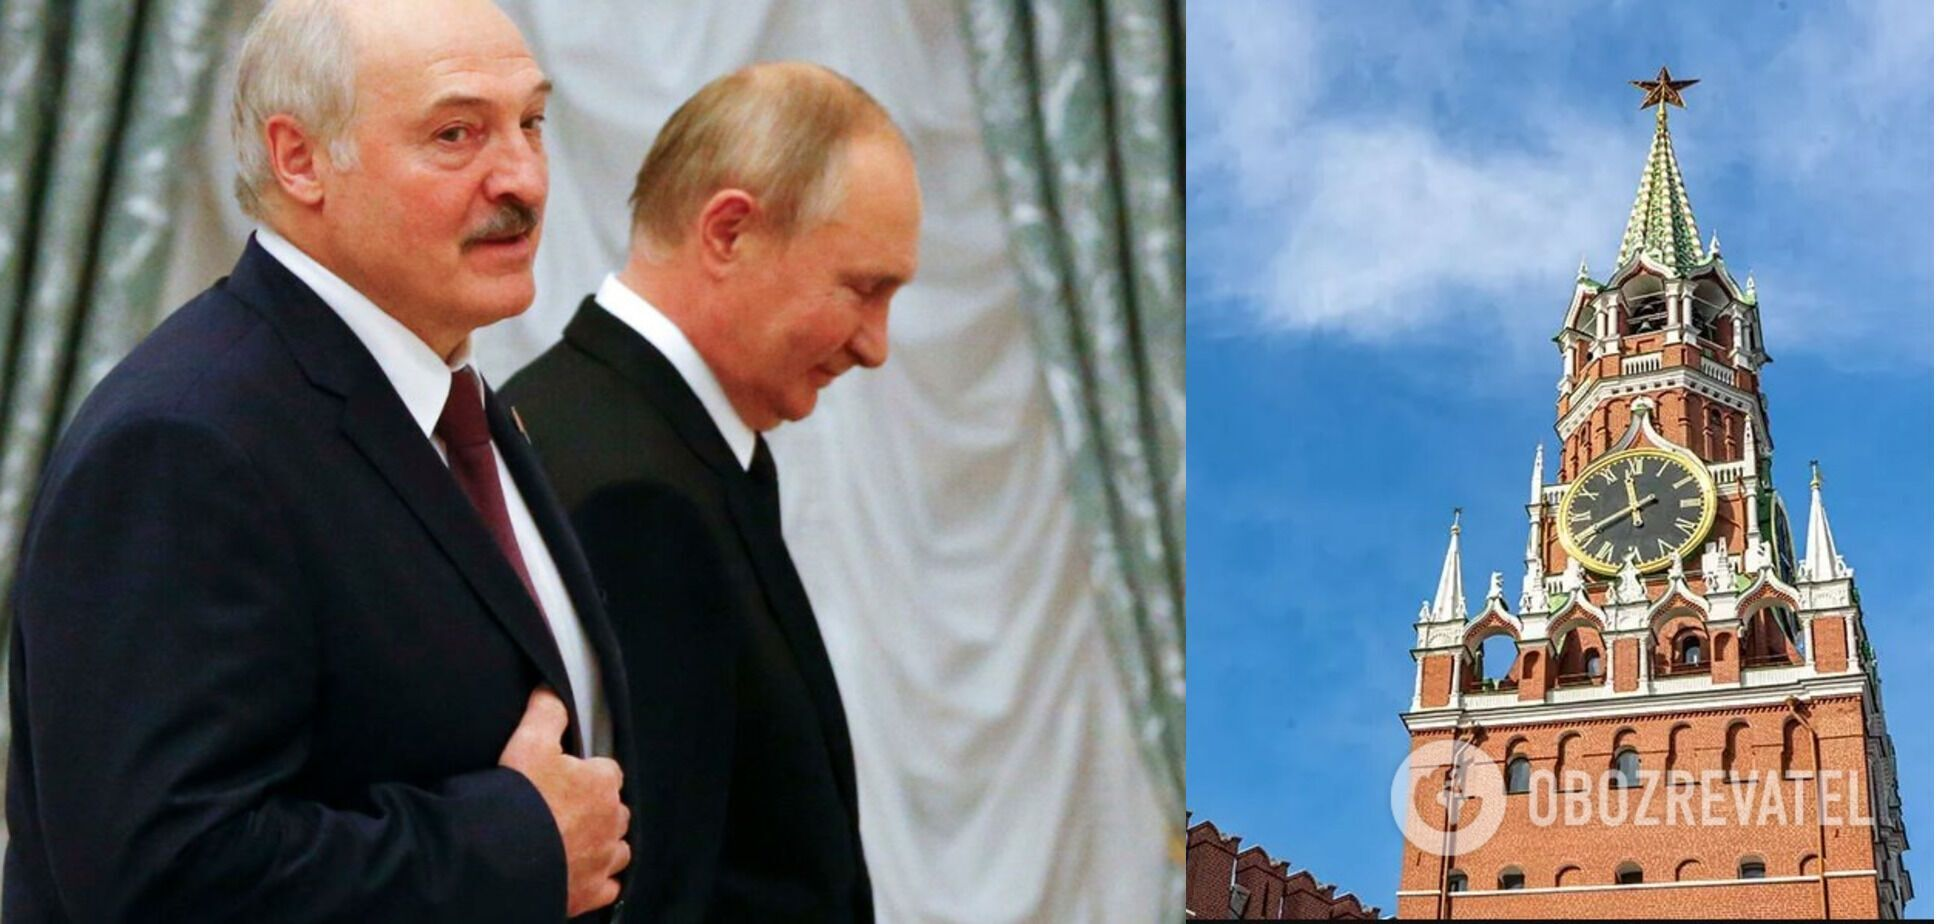 Лукашенко – гиря на ногах Путина: поглощение Беларуси ускорит крах режима в РФ